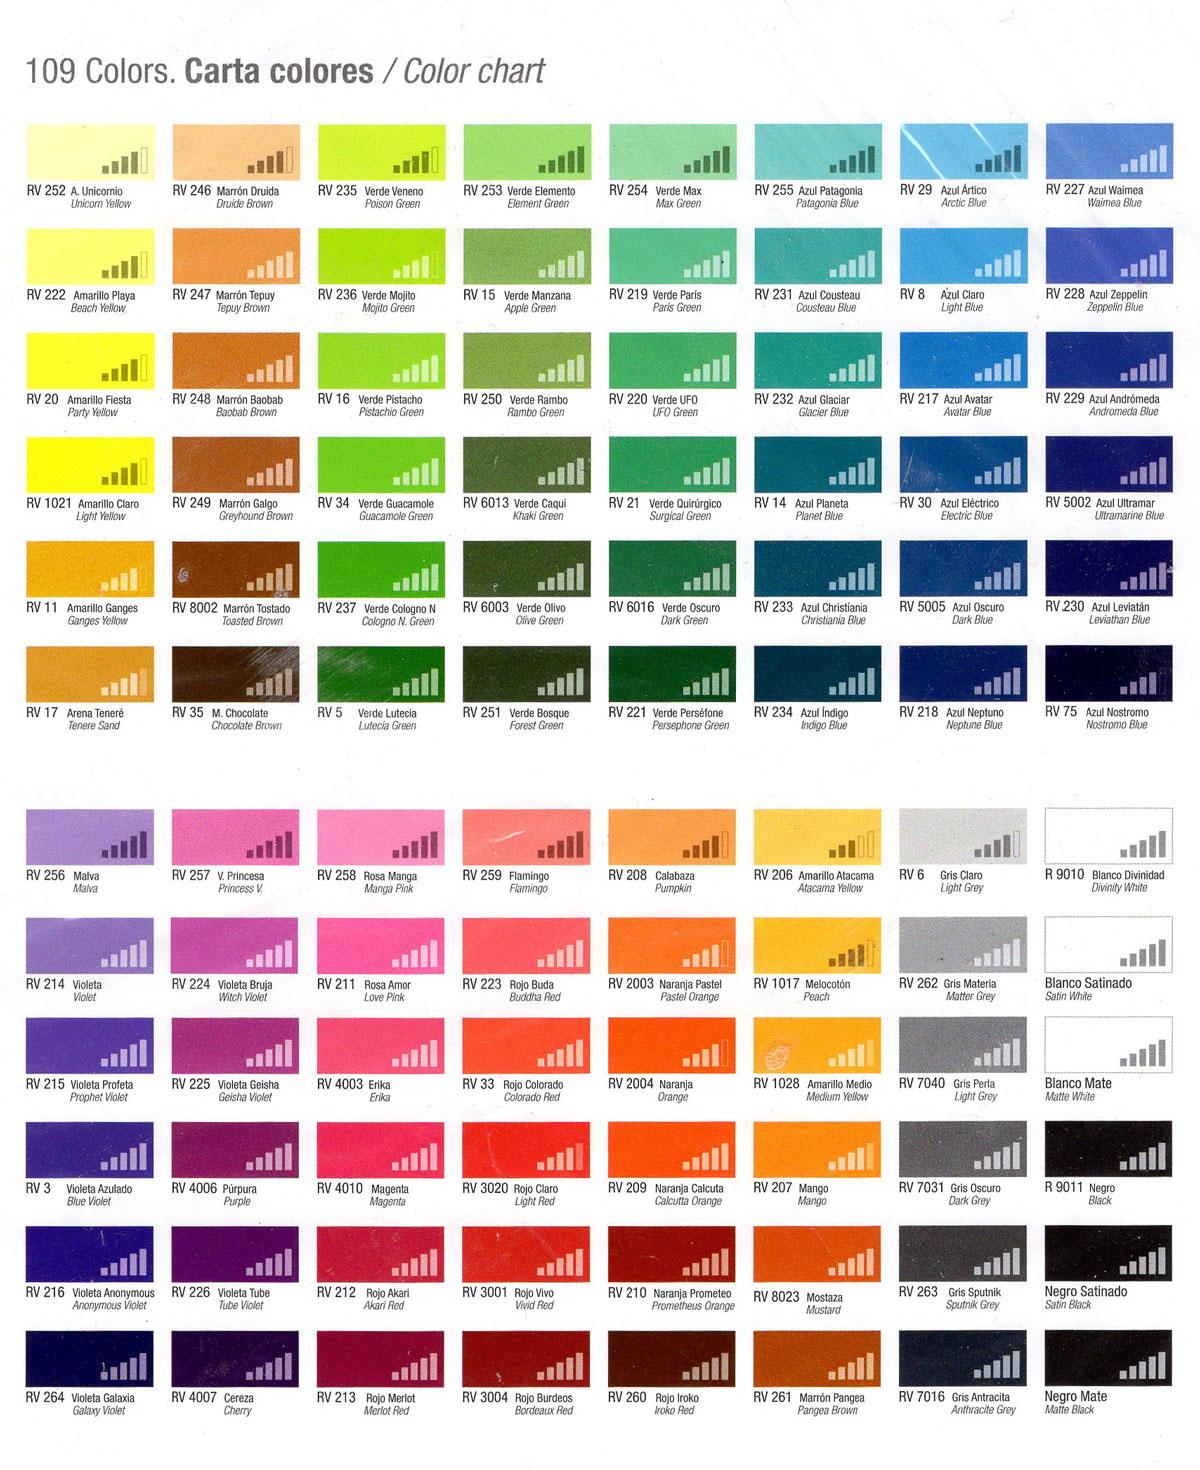 mtn-hardcore-colorchart